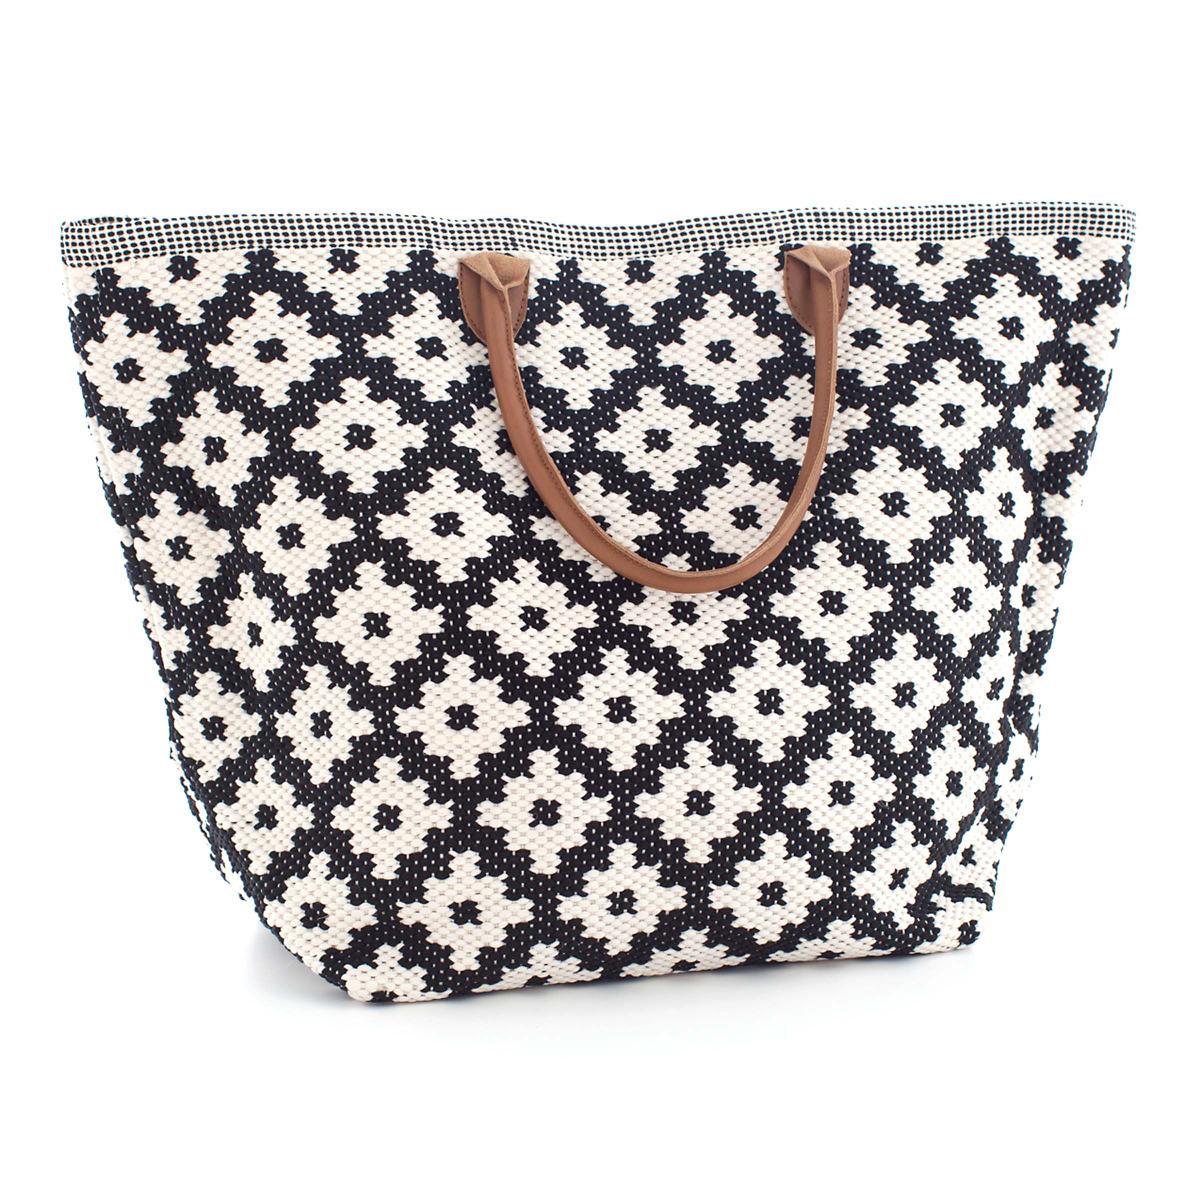 Le Tote Black/Ivory Tote Bag Grand